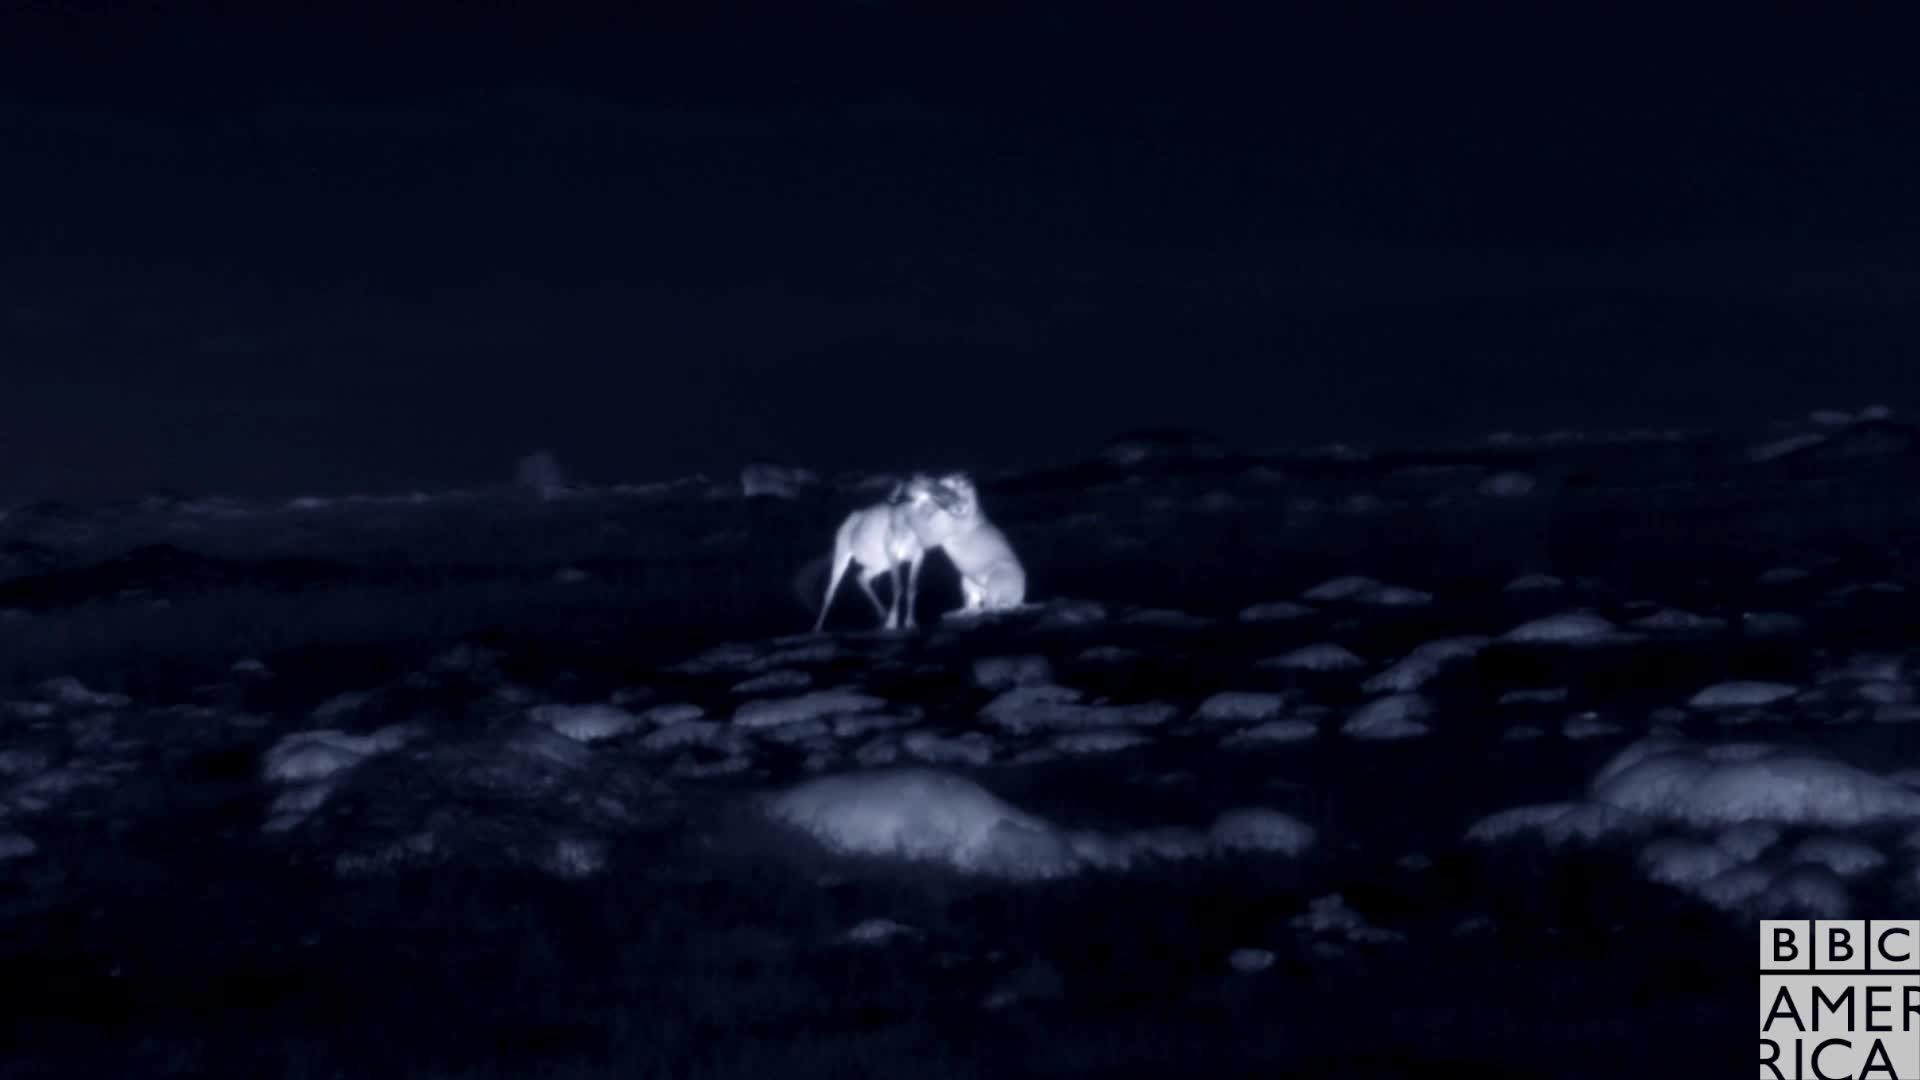 animal, animals, bbc america, bbc america: dynasties, dynasties, hunt, hunting, lion, lions, night, Dynasties Lioness Charm Hunting at Night GIFs